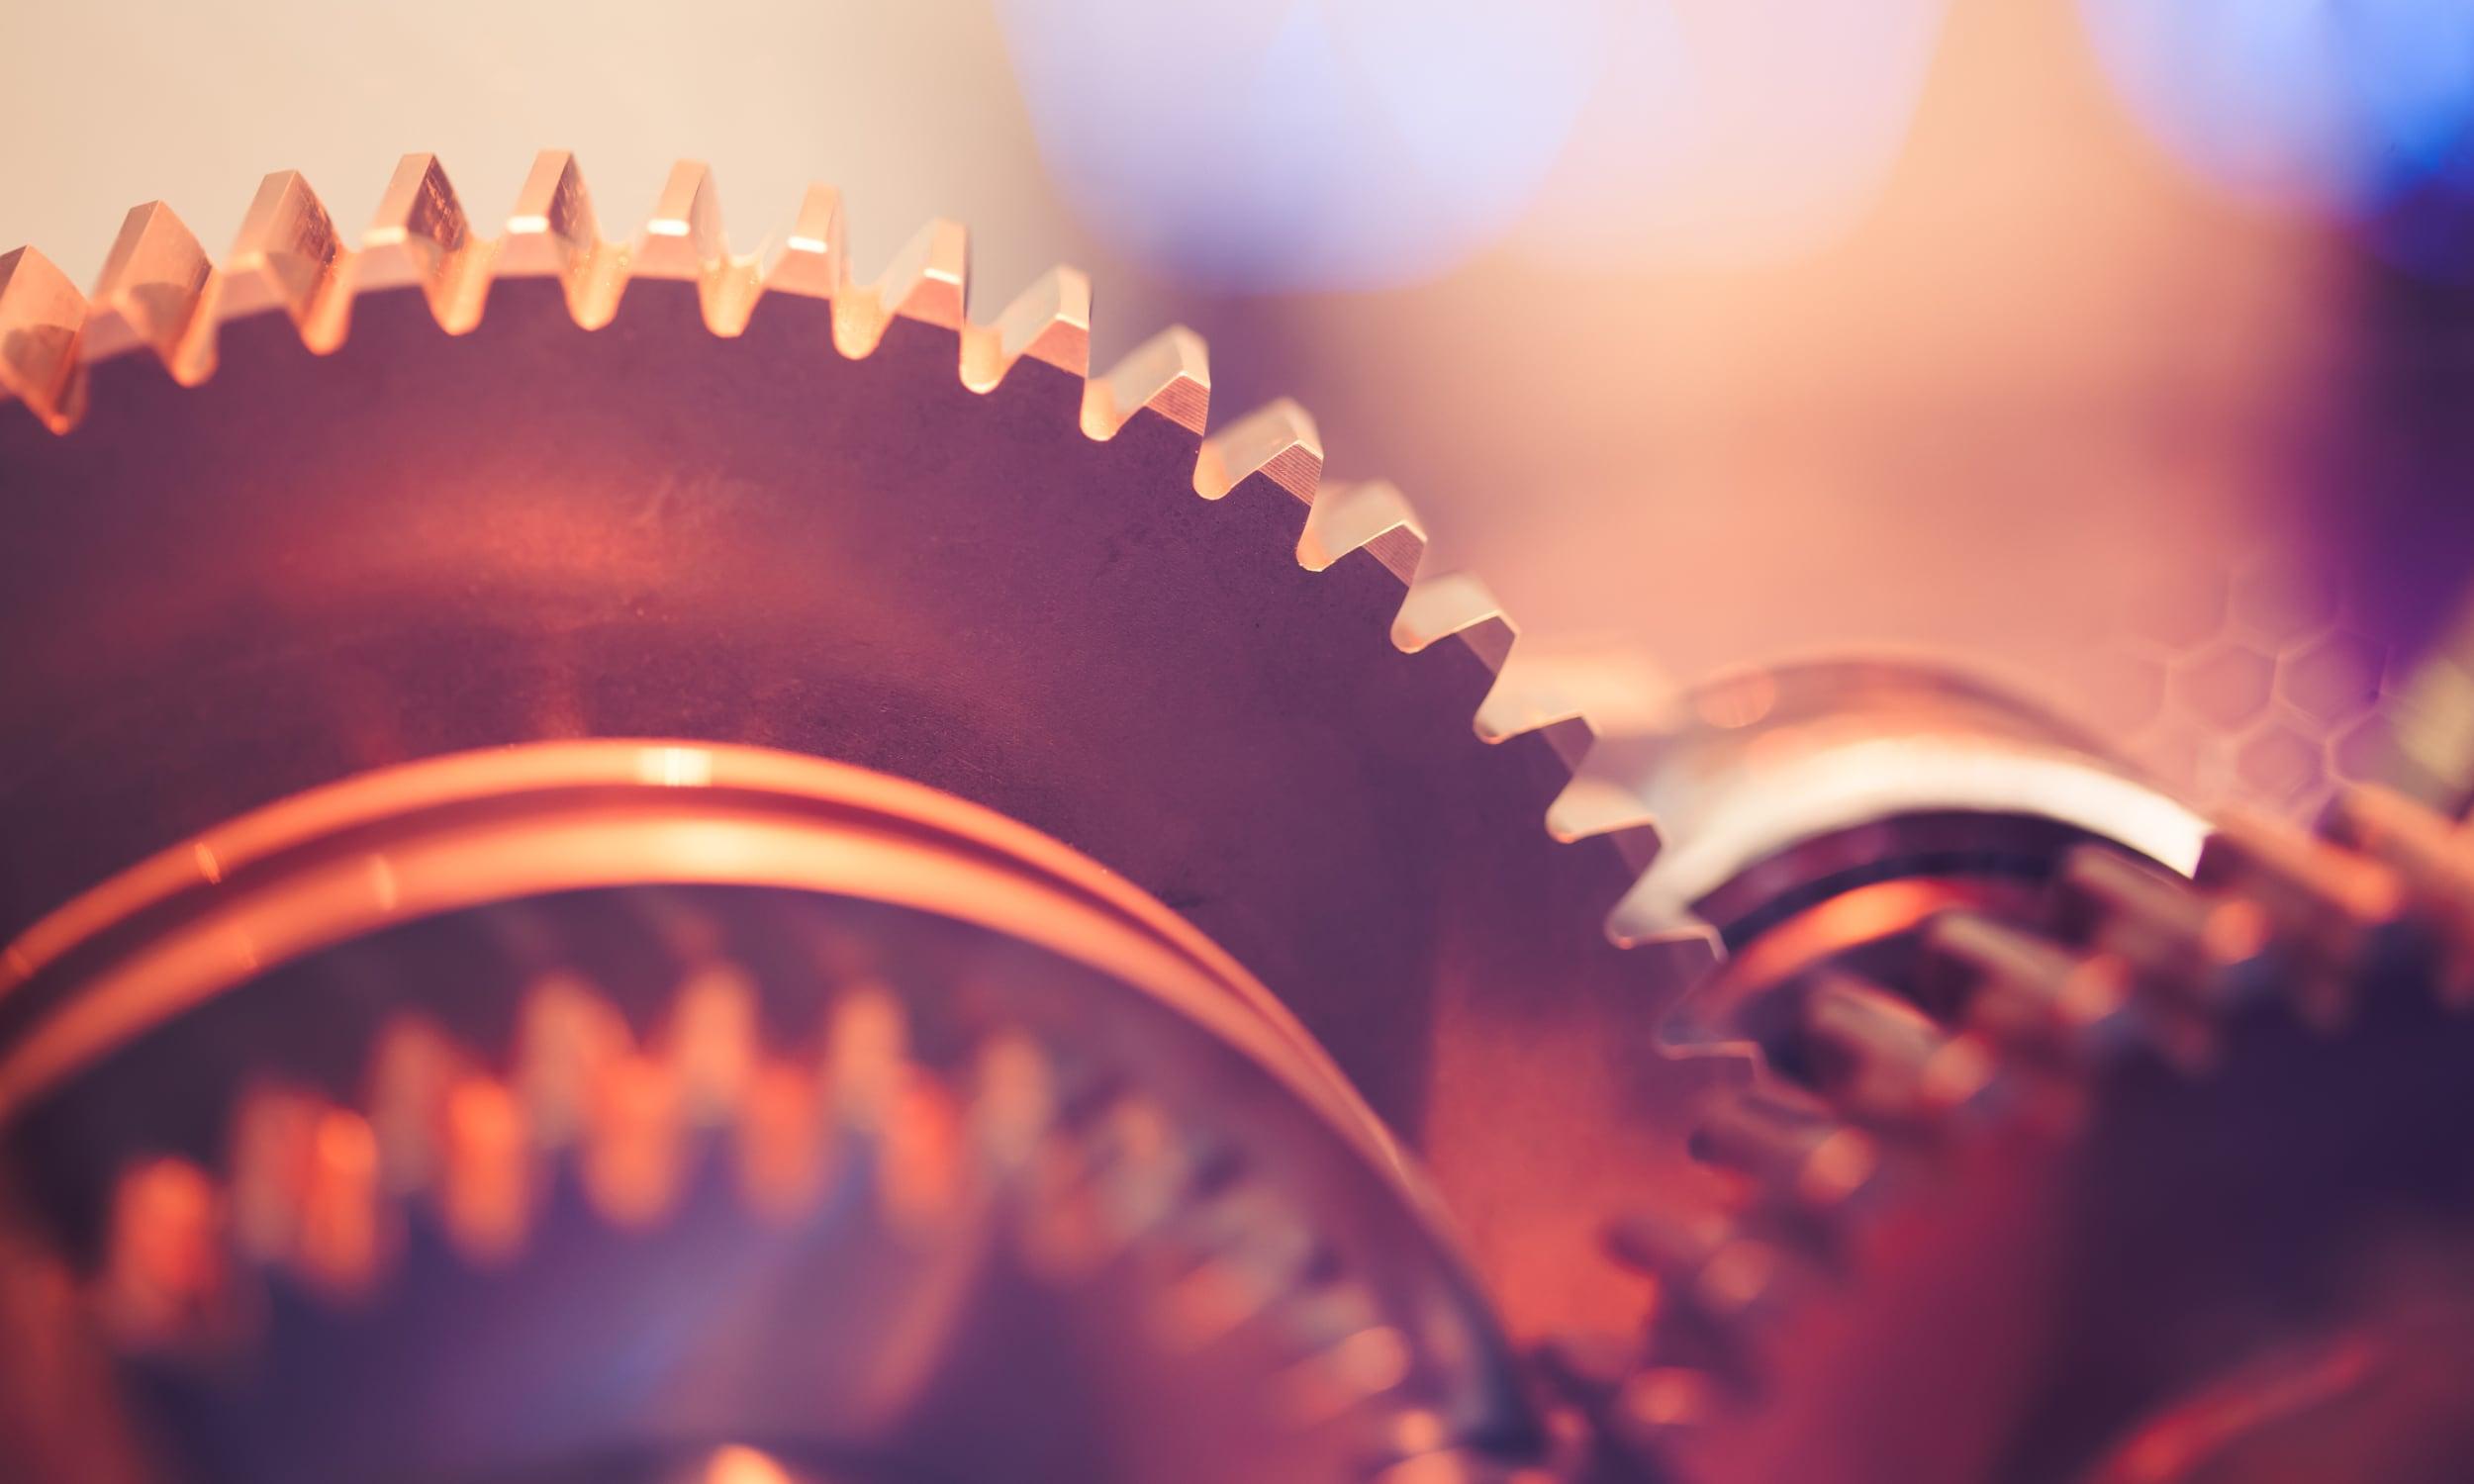 Trattamenti industriali Impreglon per l'industria meccanica